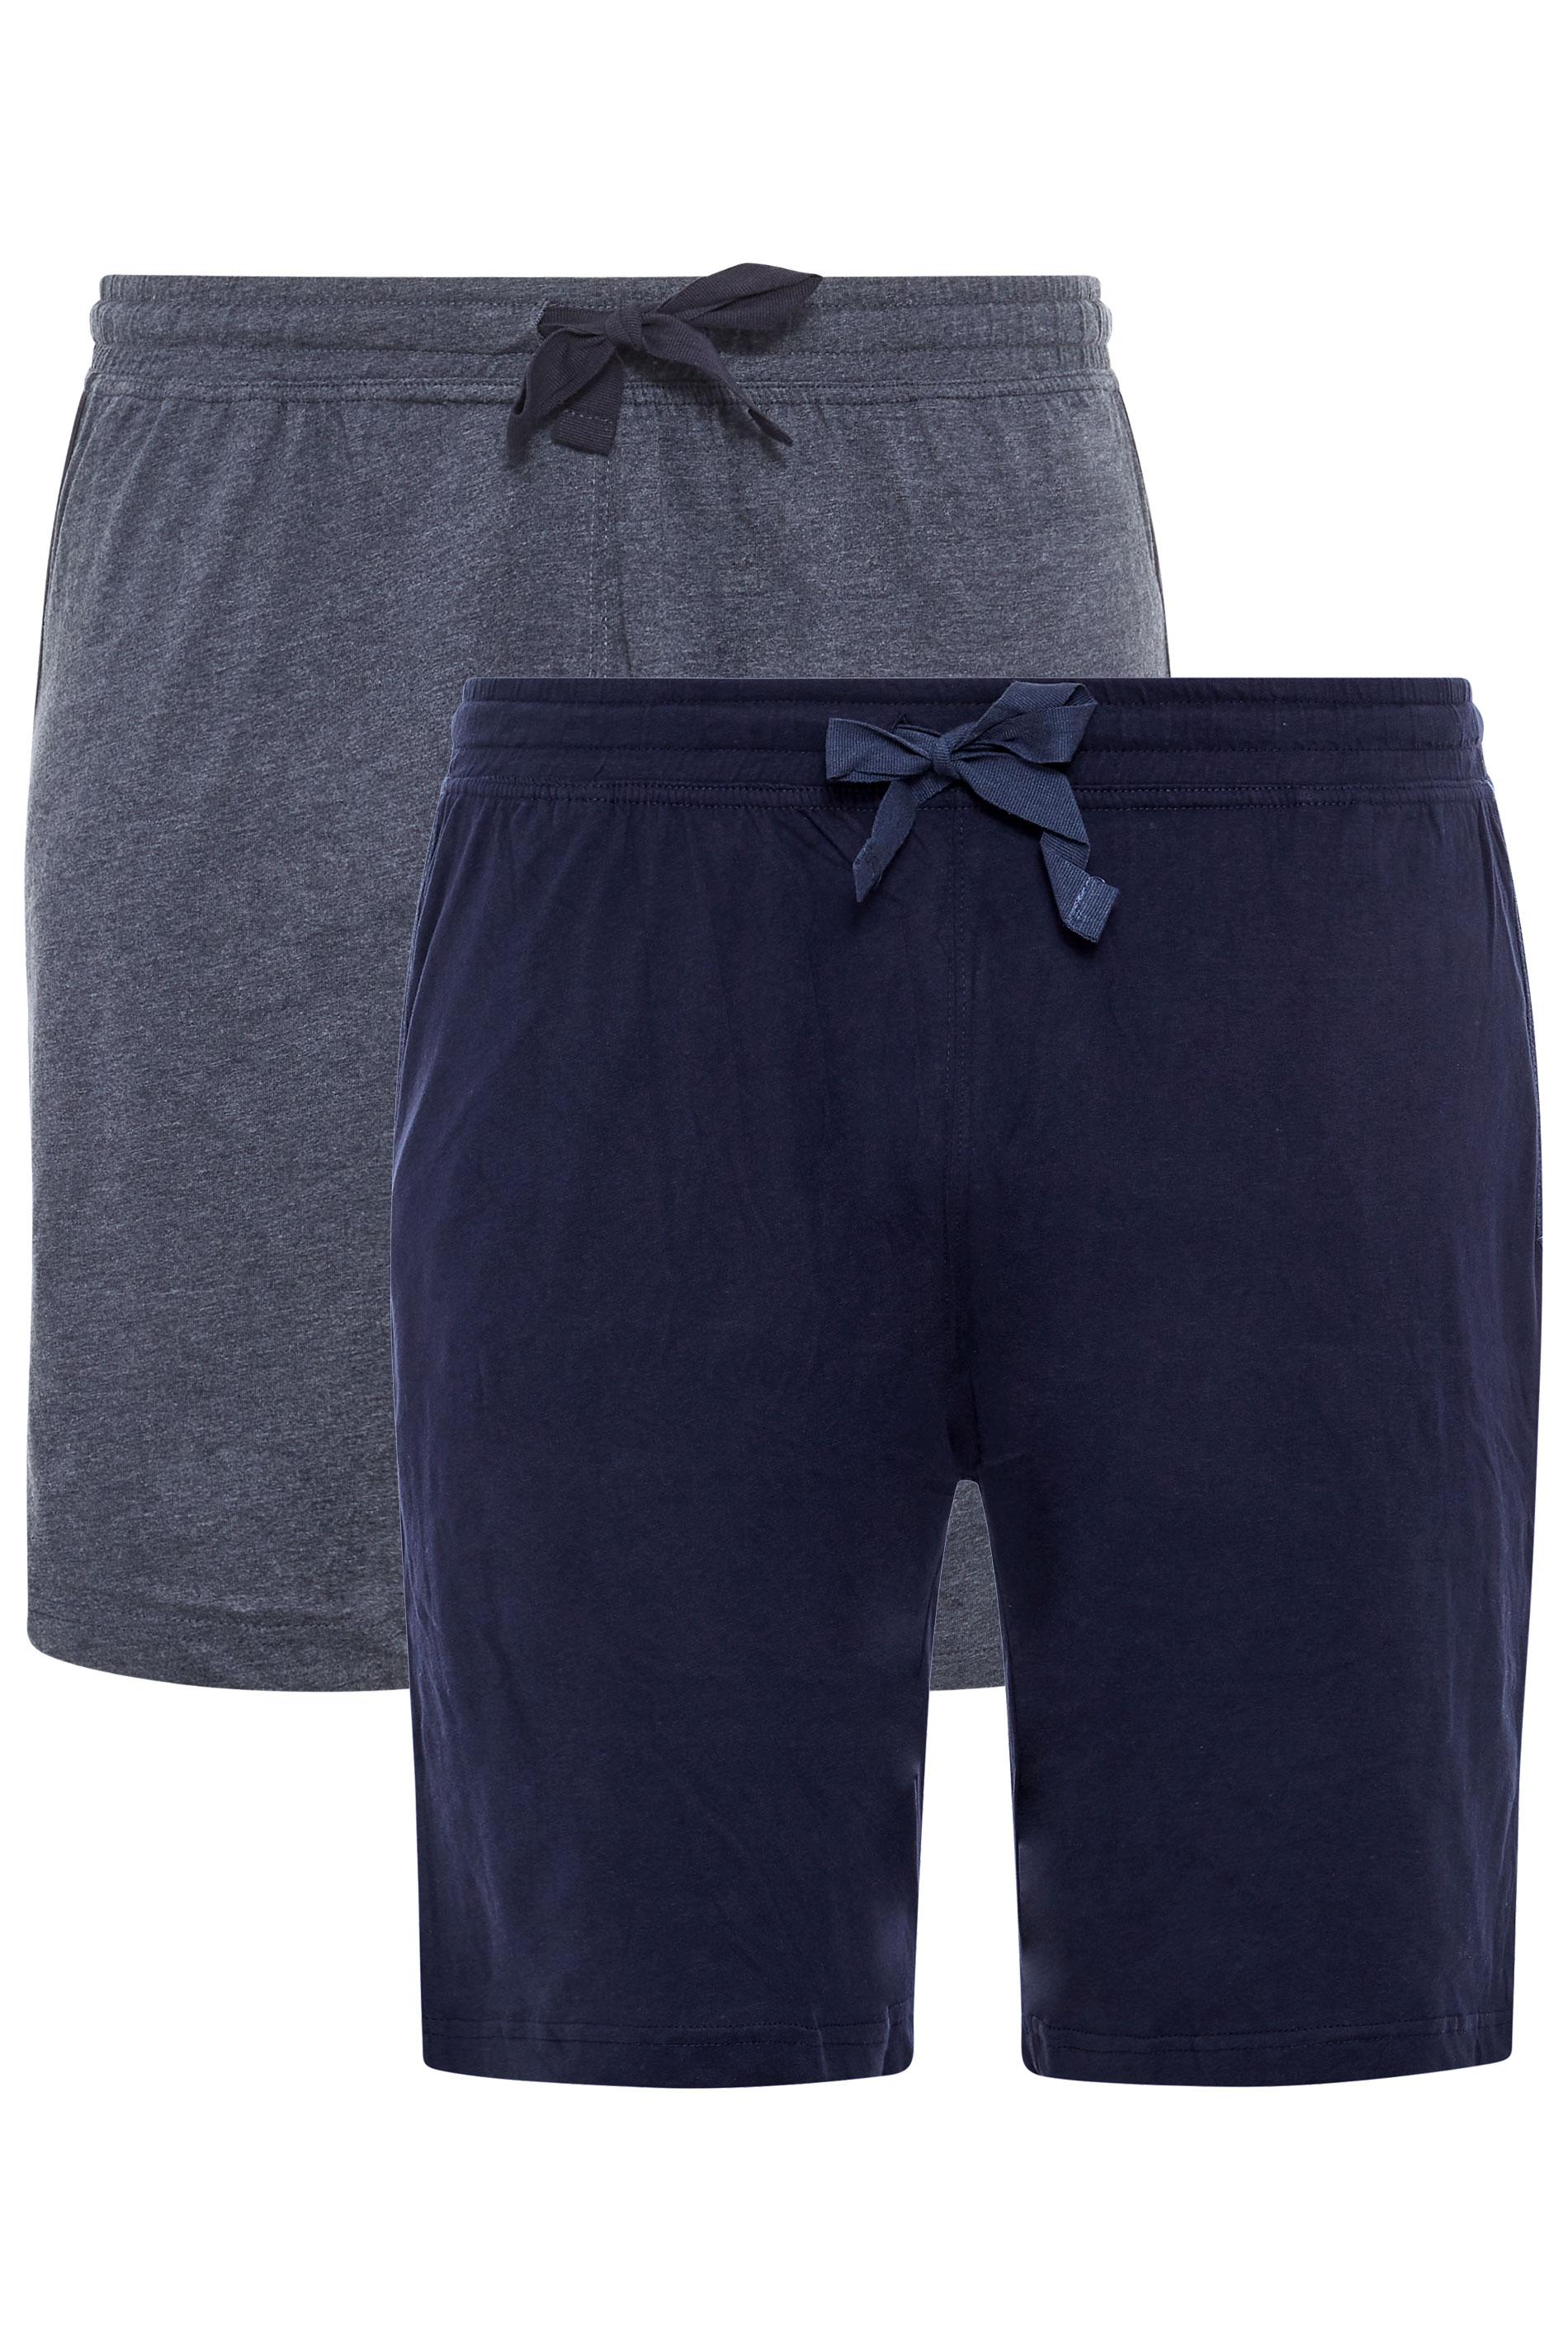 D555 2 PACK Navy Jogger Shorts